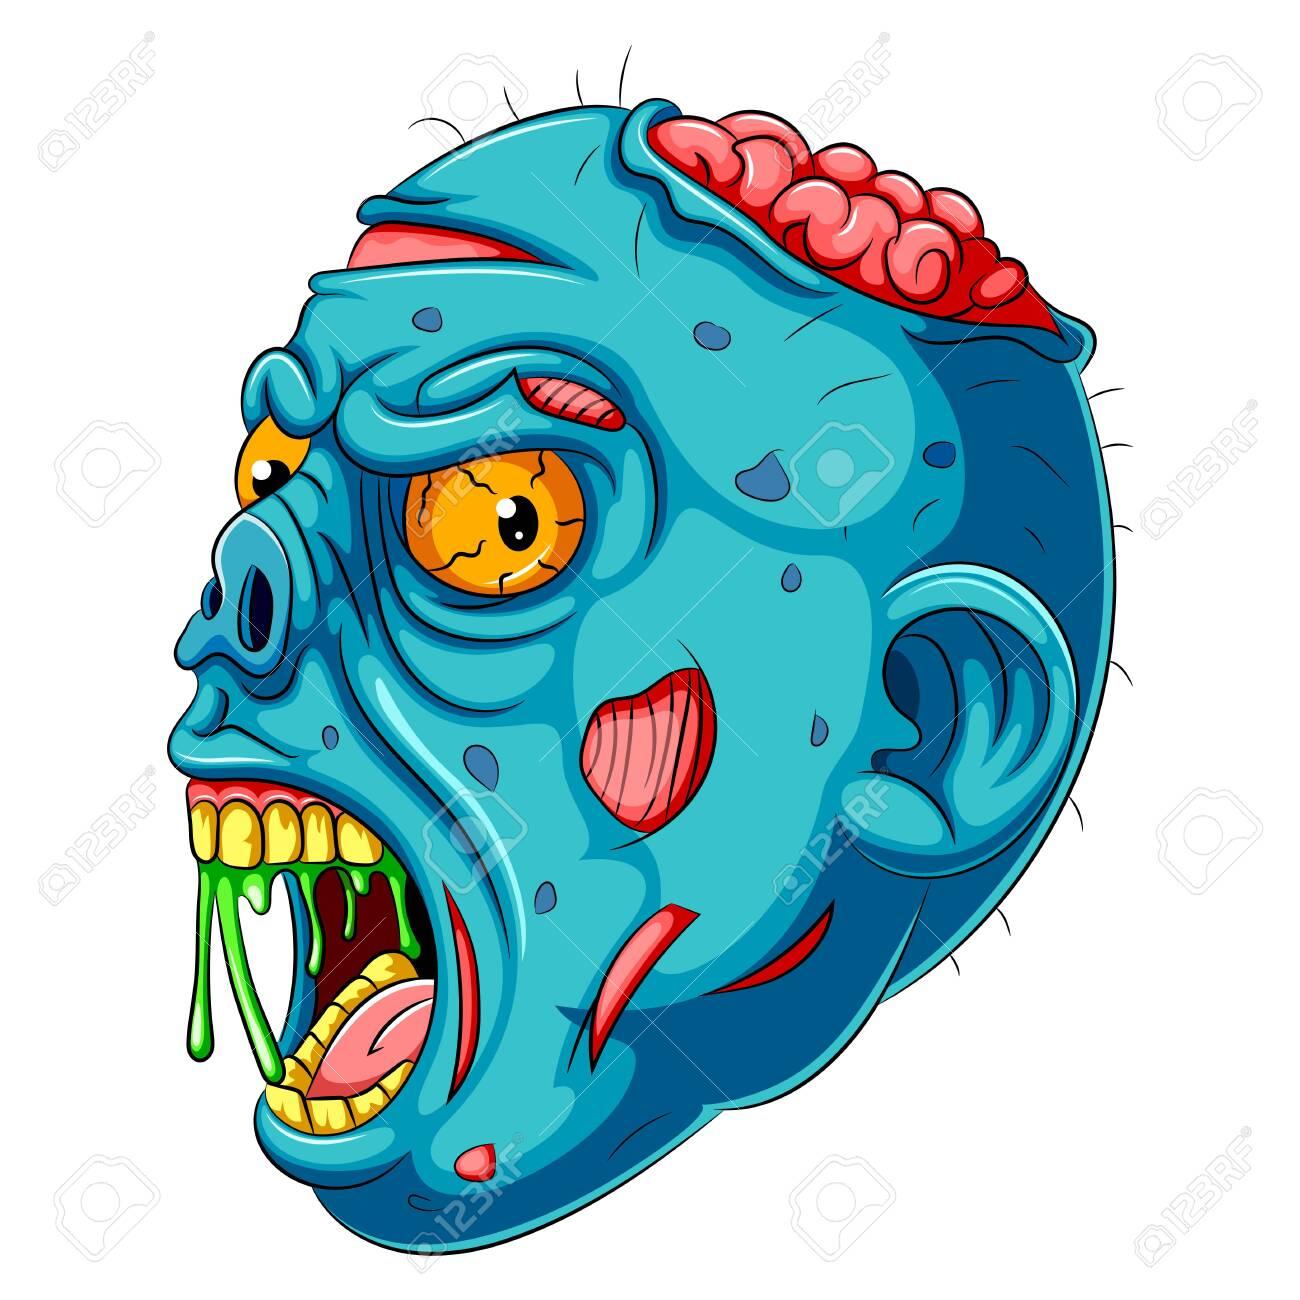 illustration of A Cartoon blue Zombie head - 128159957